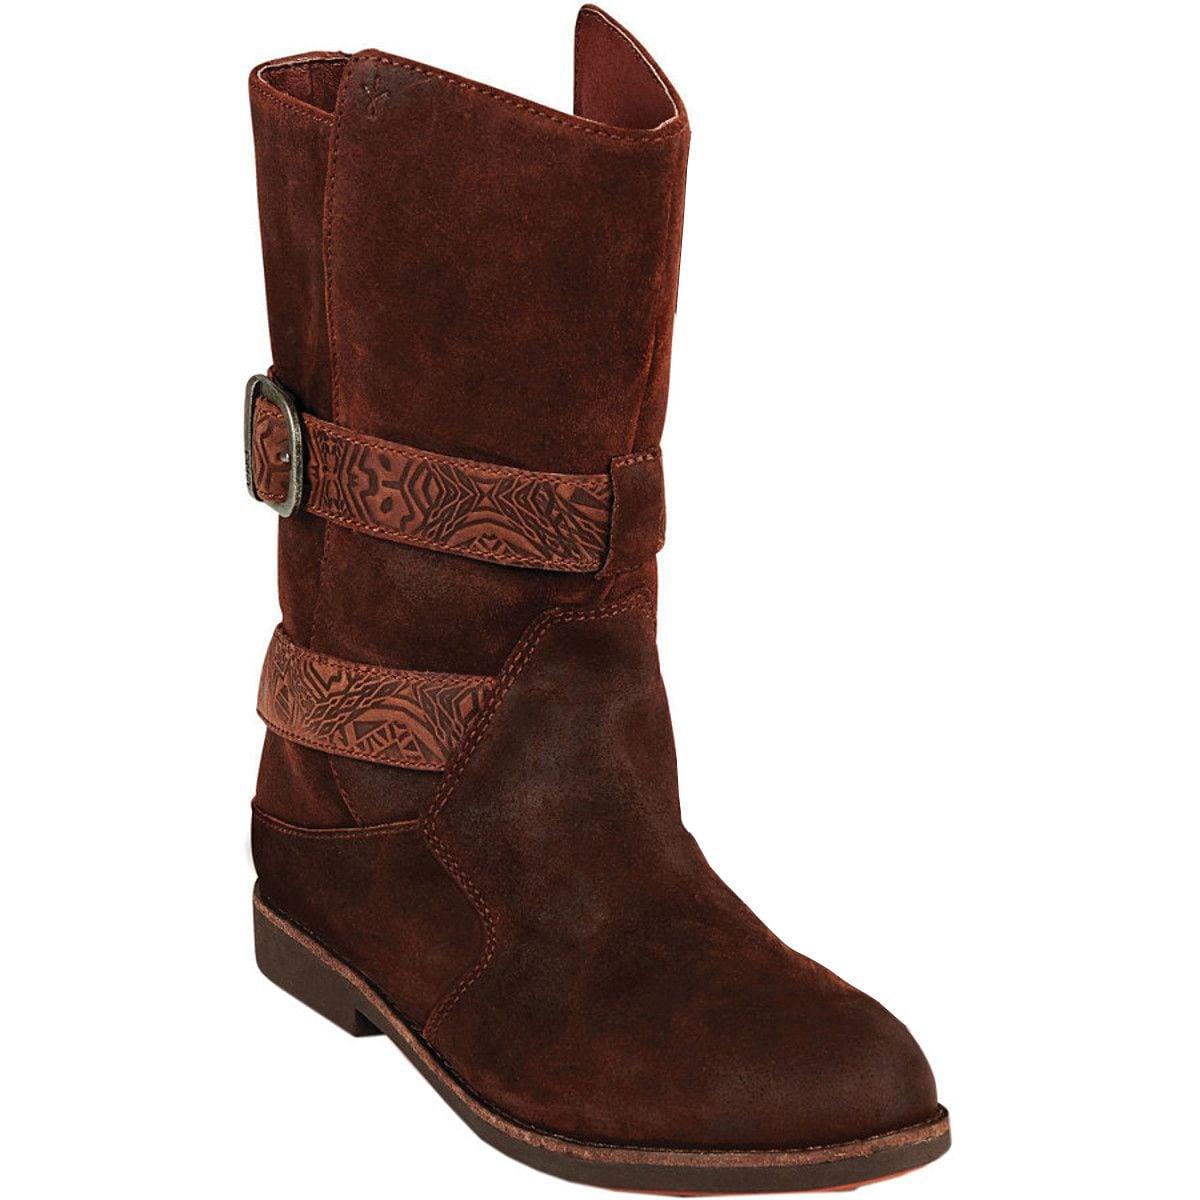 EMU Ainslie Boot - Women's